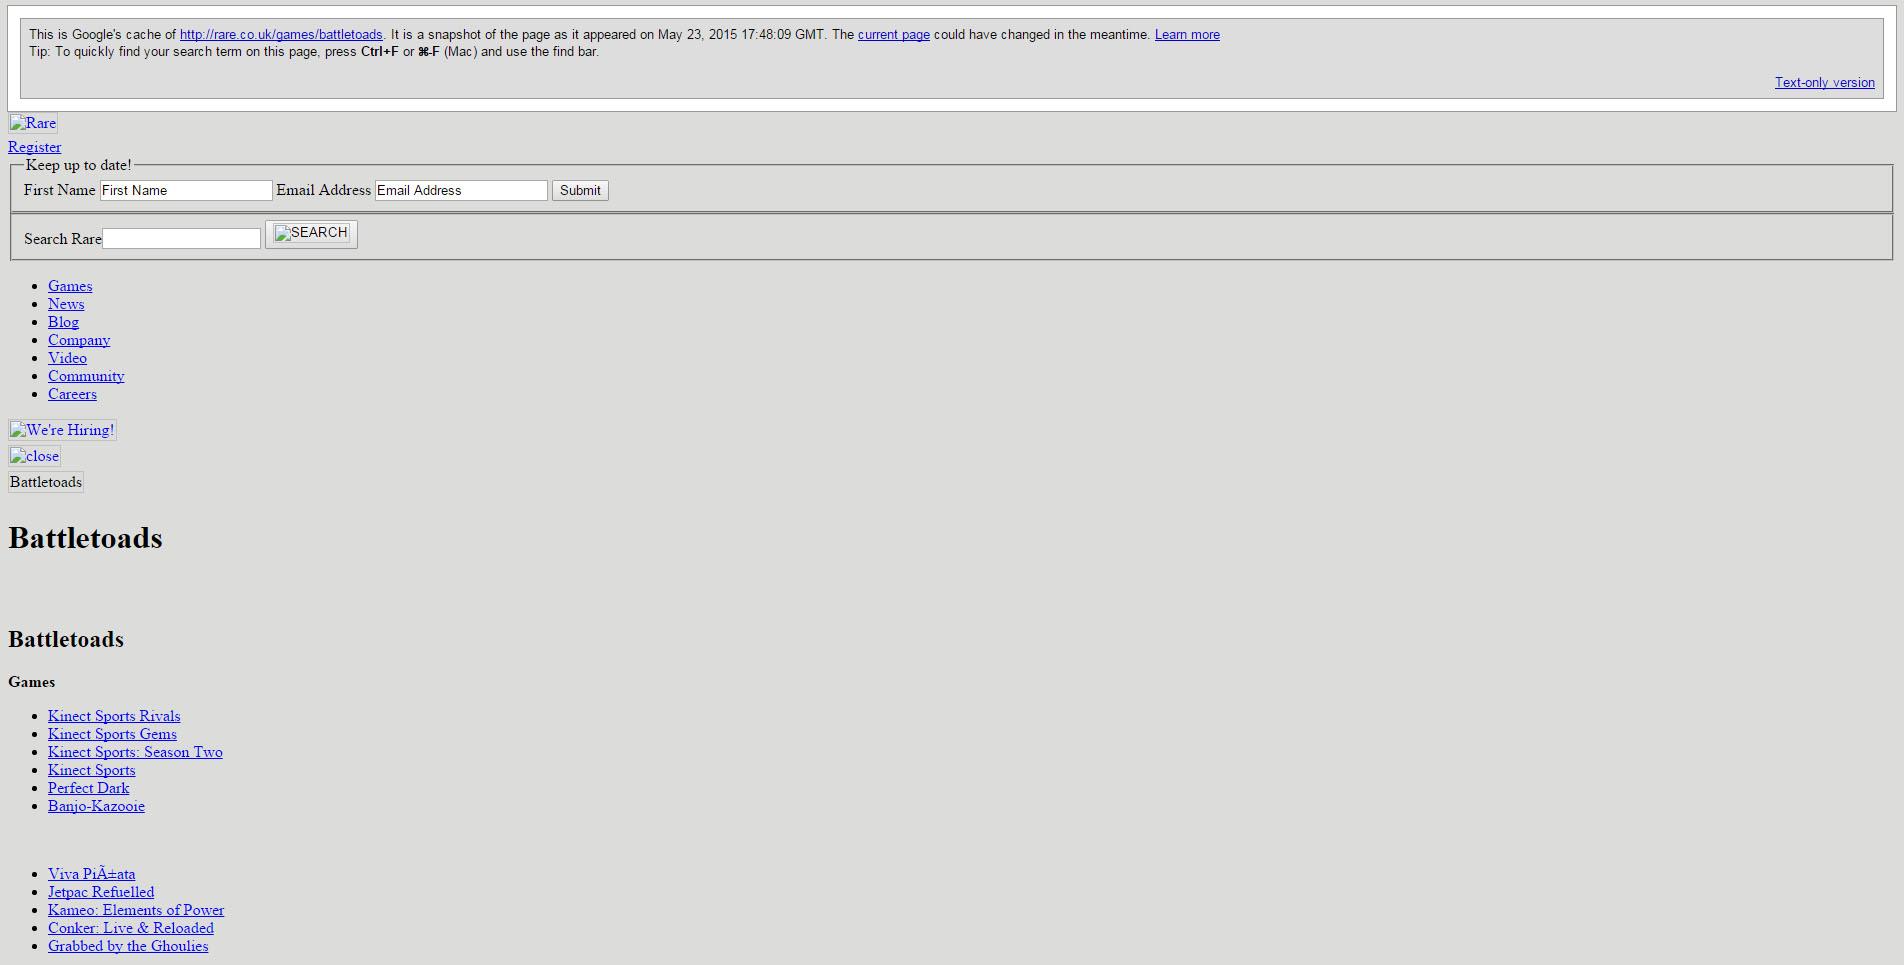 Battletoads-Web-Page_06-13-15_002